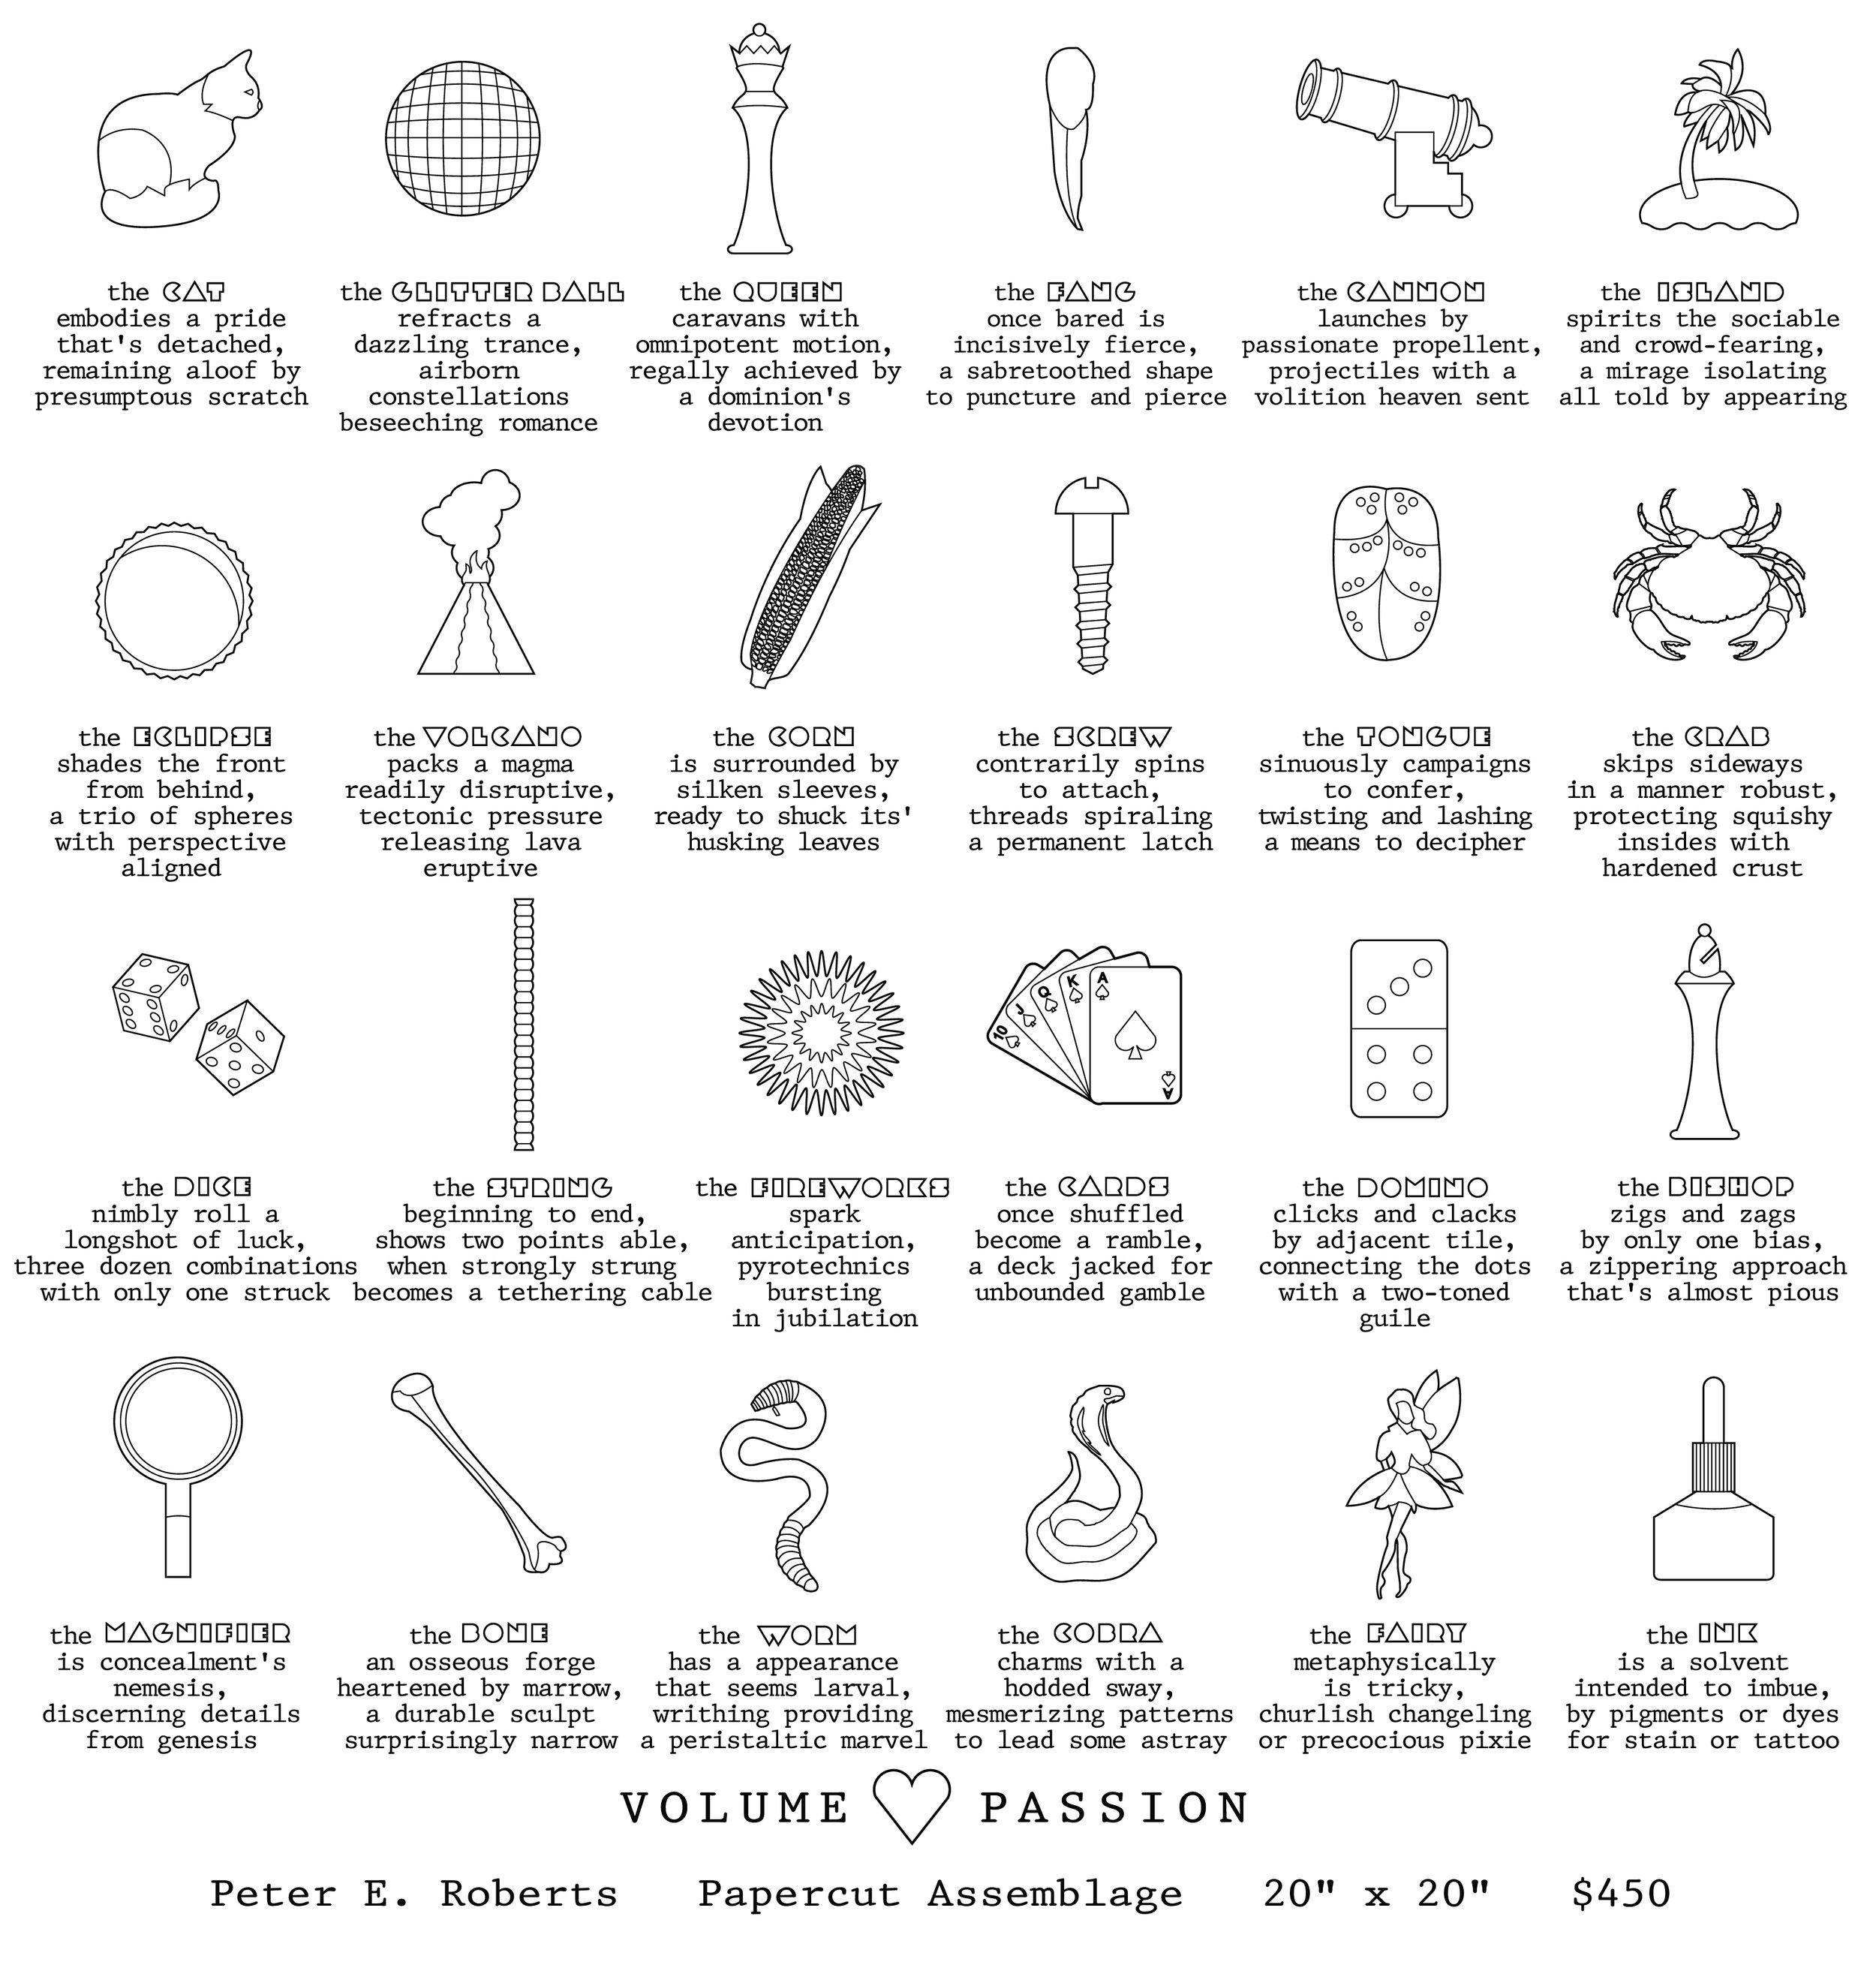 Peter-E-Roberts-Volume-Passion-13.jpg